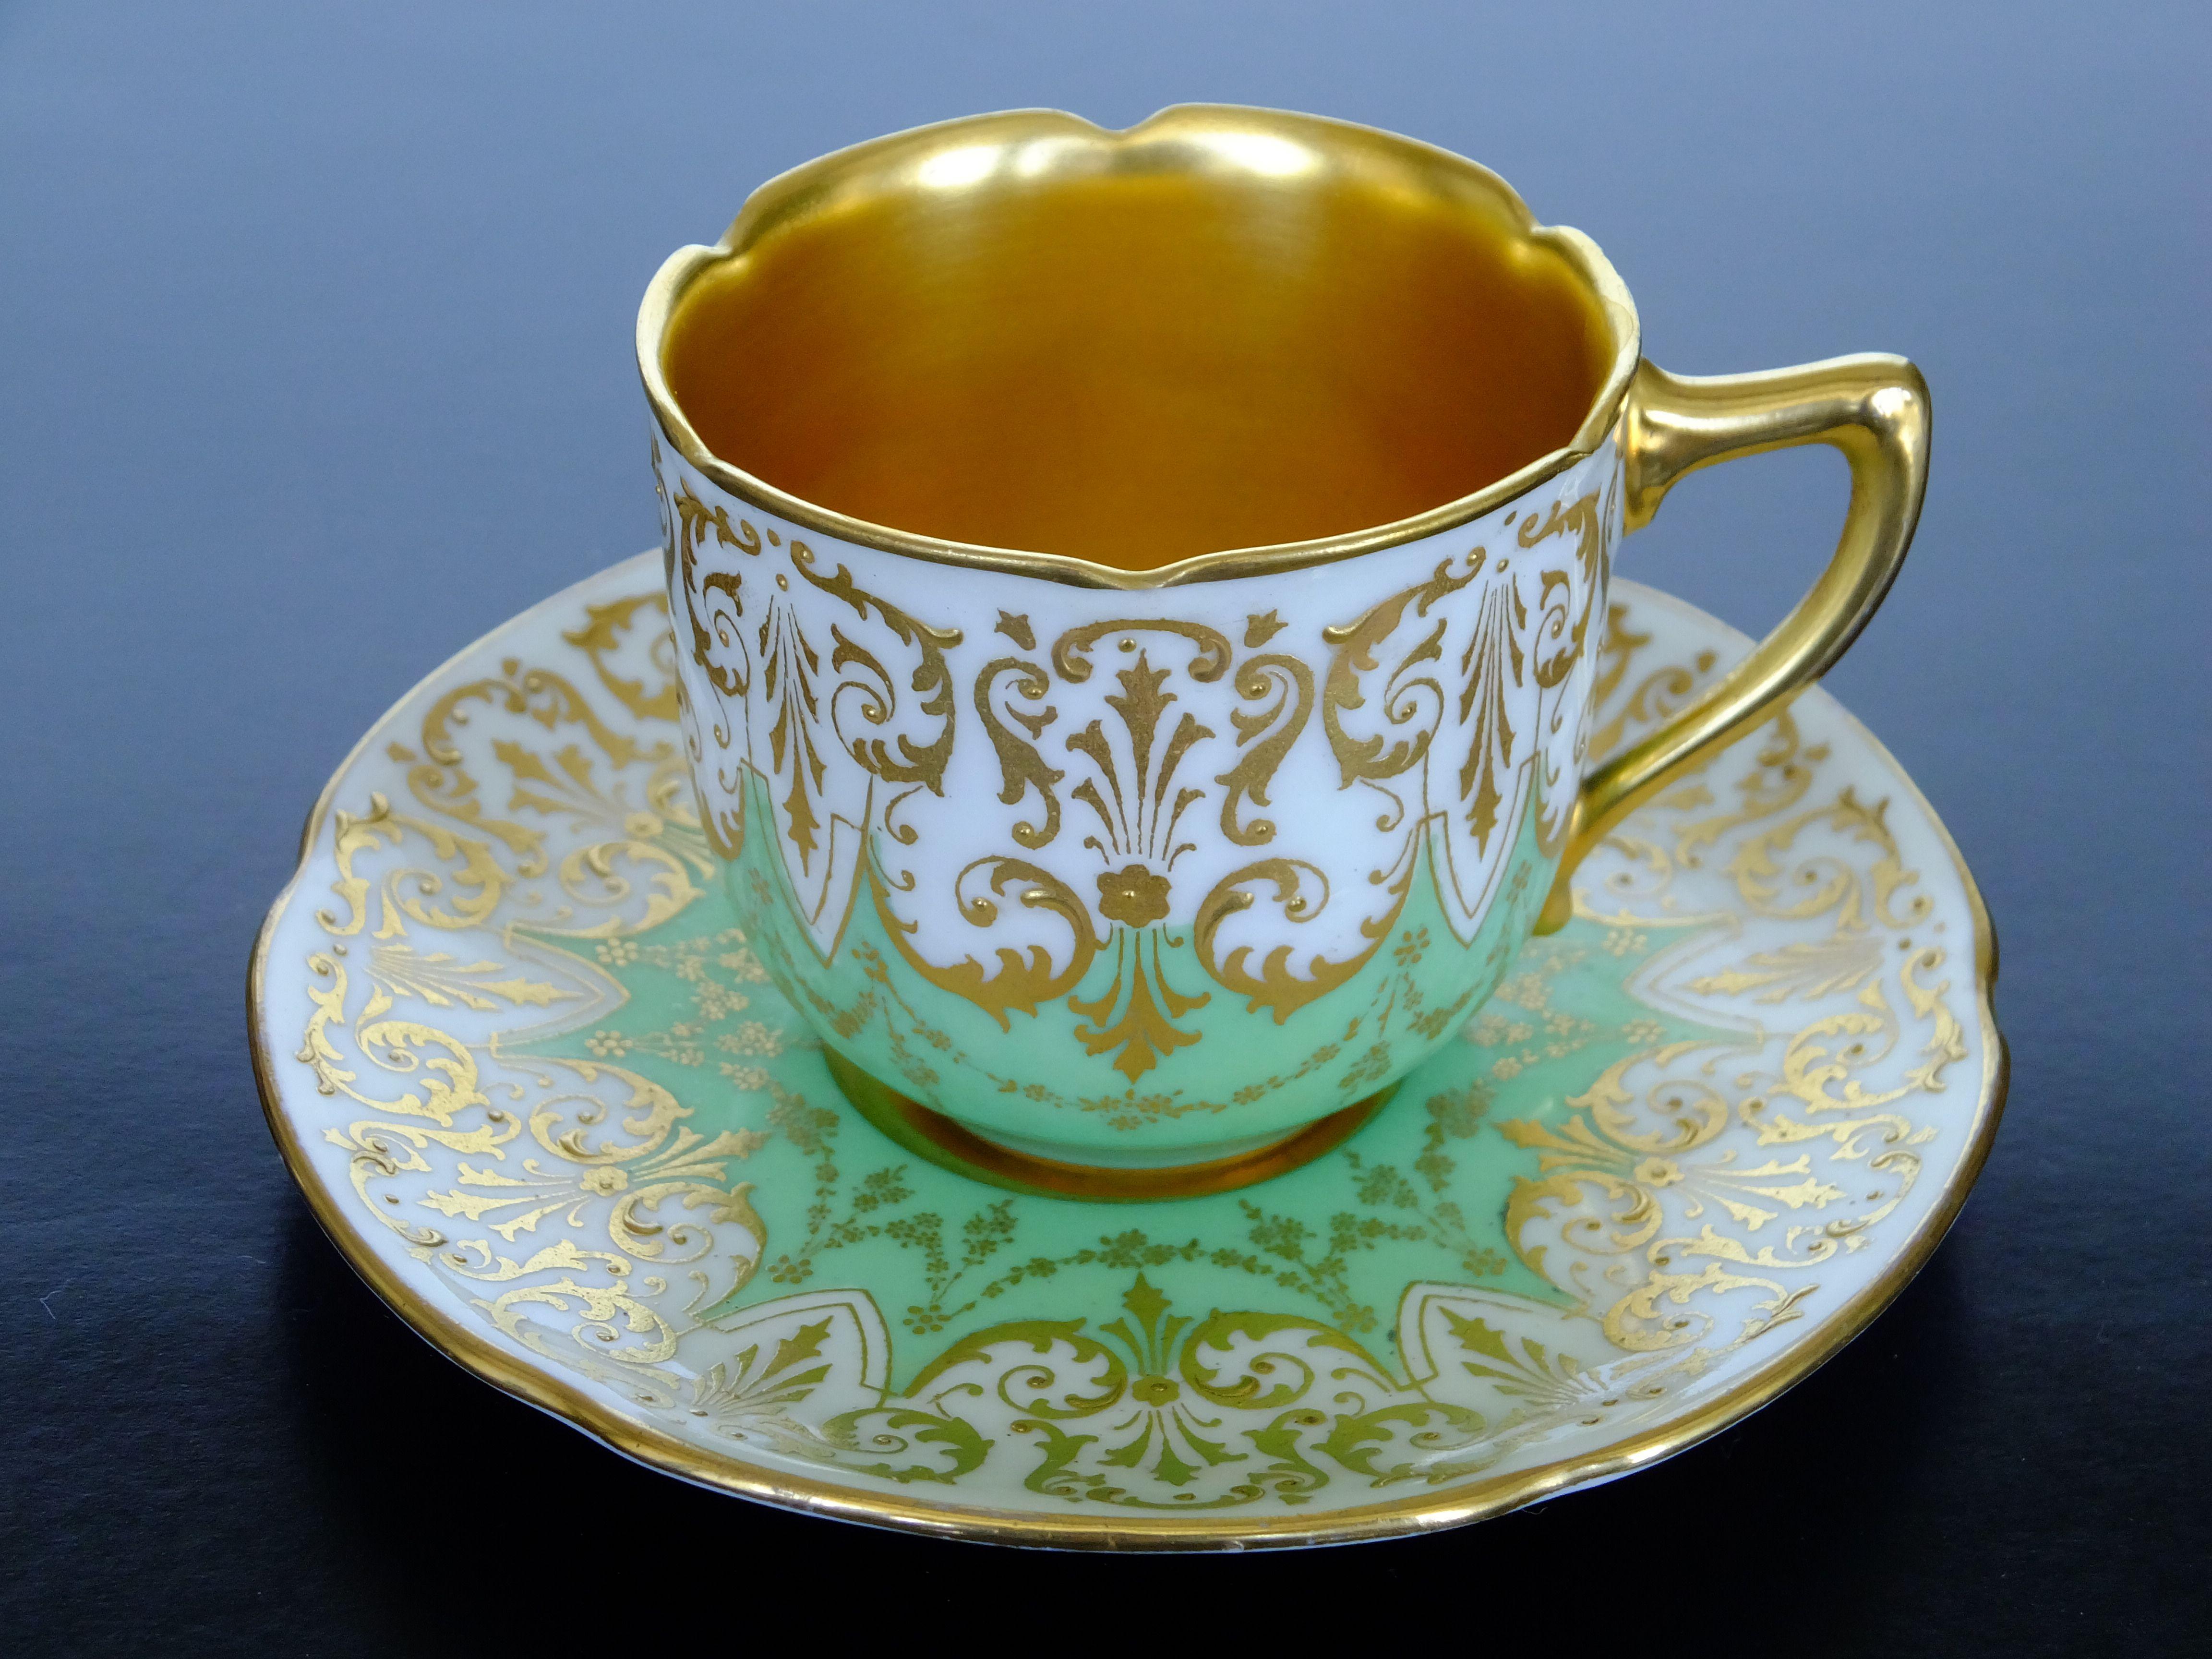 Royal Doulton UK 1902-1922 | Teacup Crazy | Pinterest | Royal ...